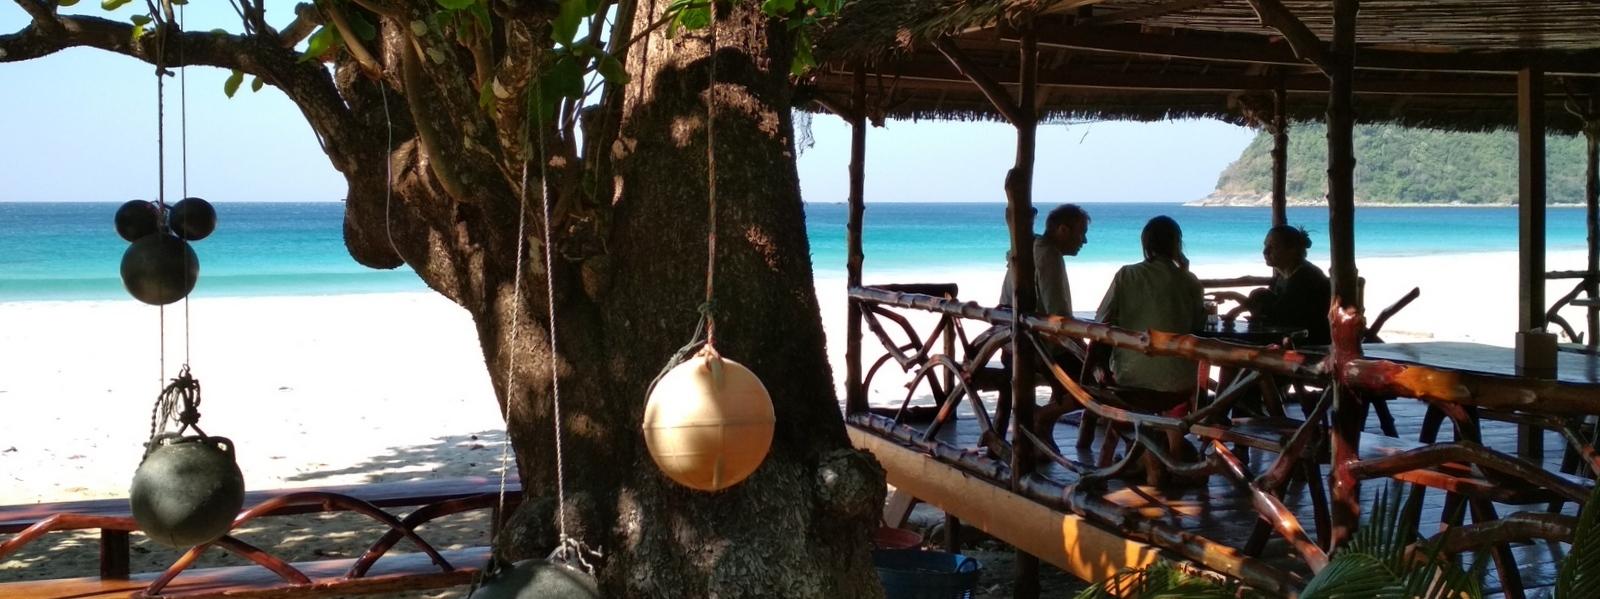 Beach-restaurant-Sin-Htauk-Dawei